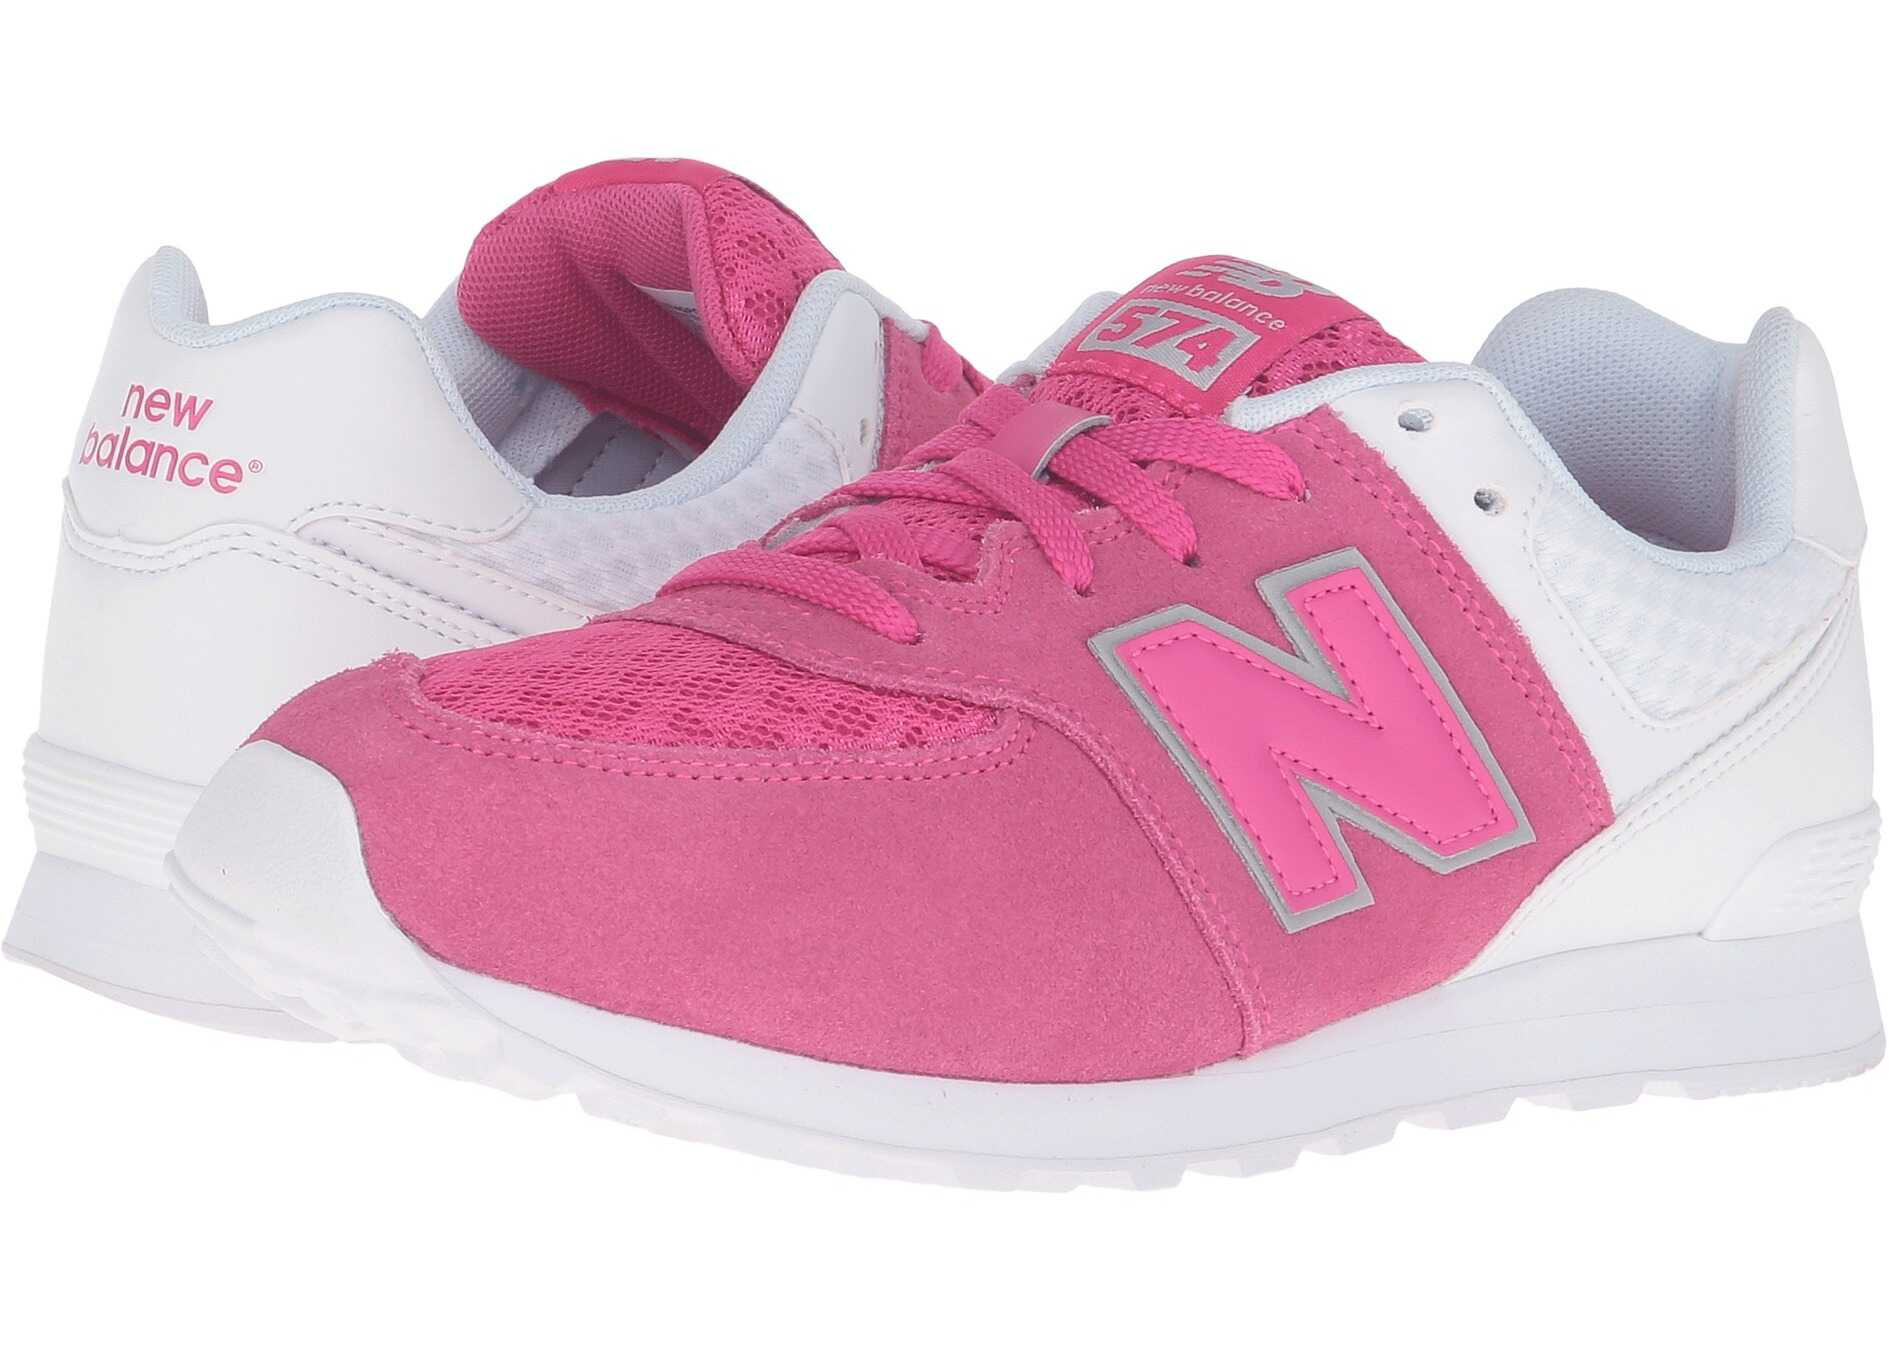 New Balance Kids 574 Breathe (Big Kid) Pink/White